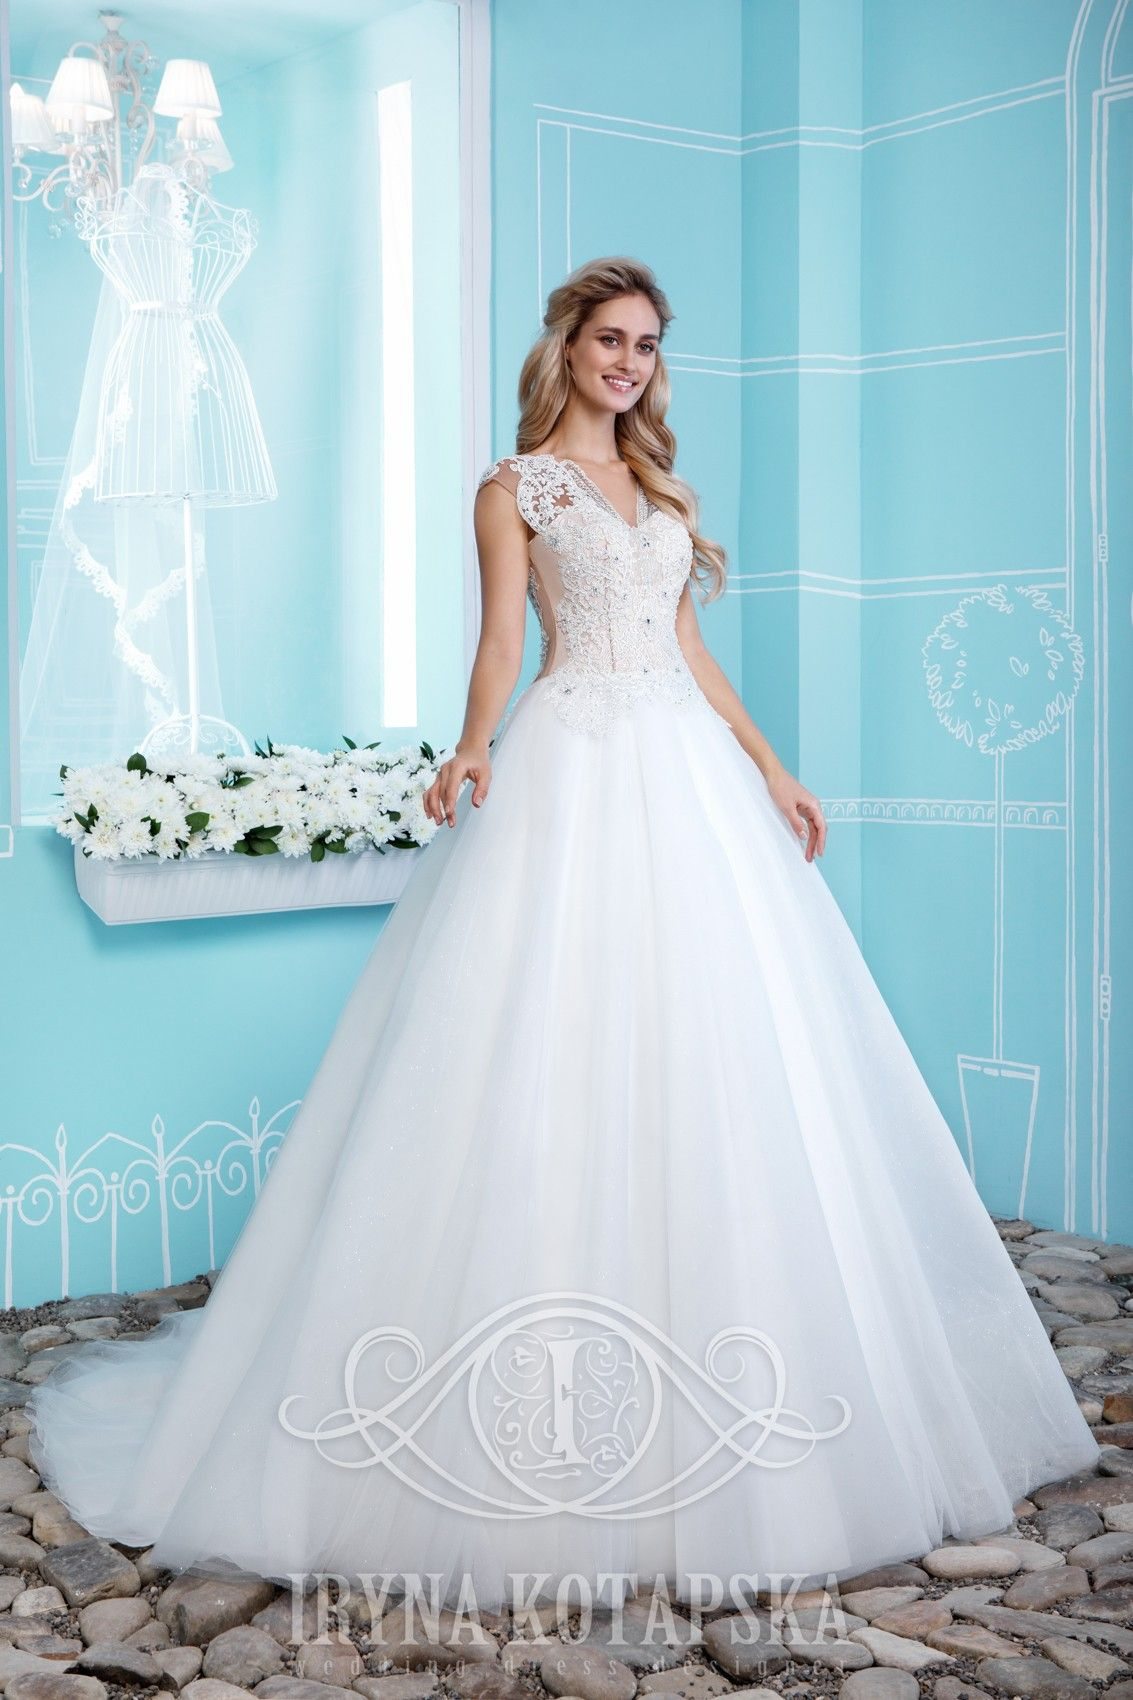 Pin by Vanda Desiree on ♥Wedding dresses♥ | Pinterest | Wedding ...